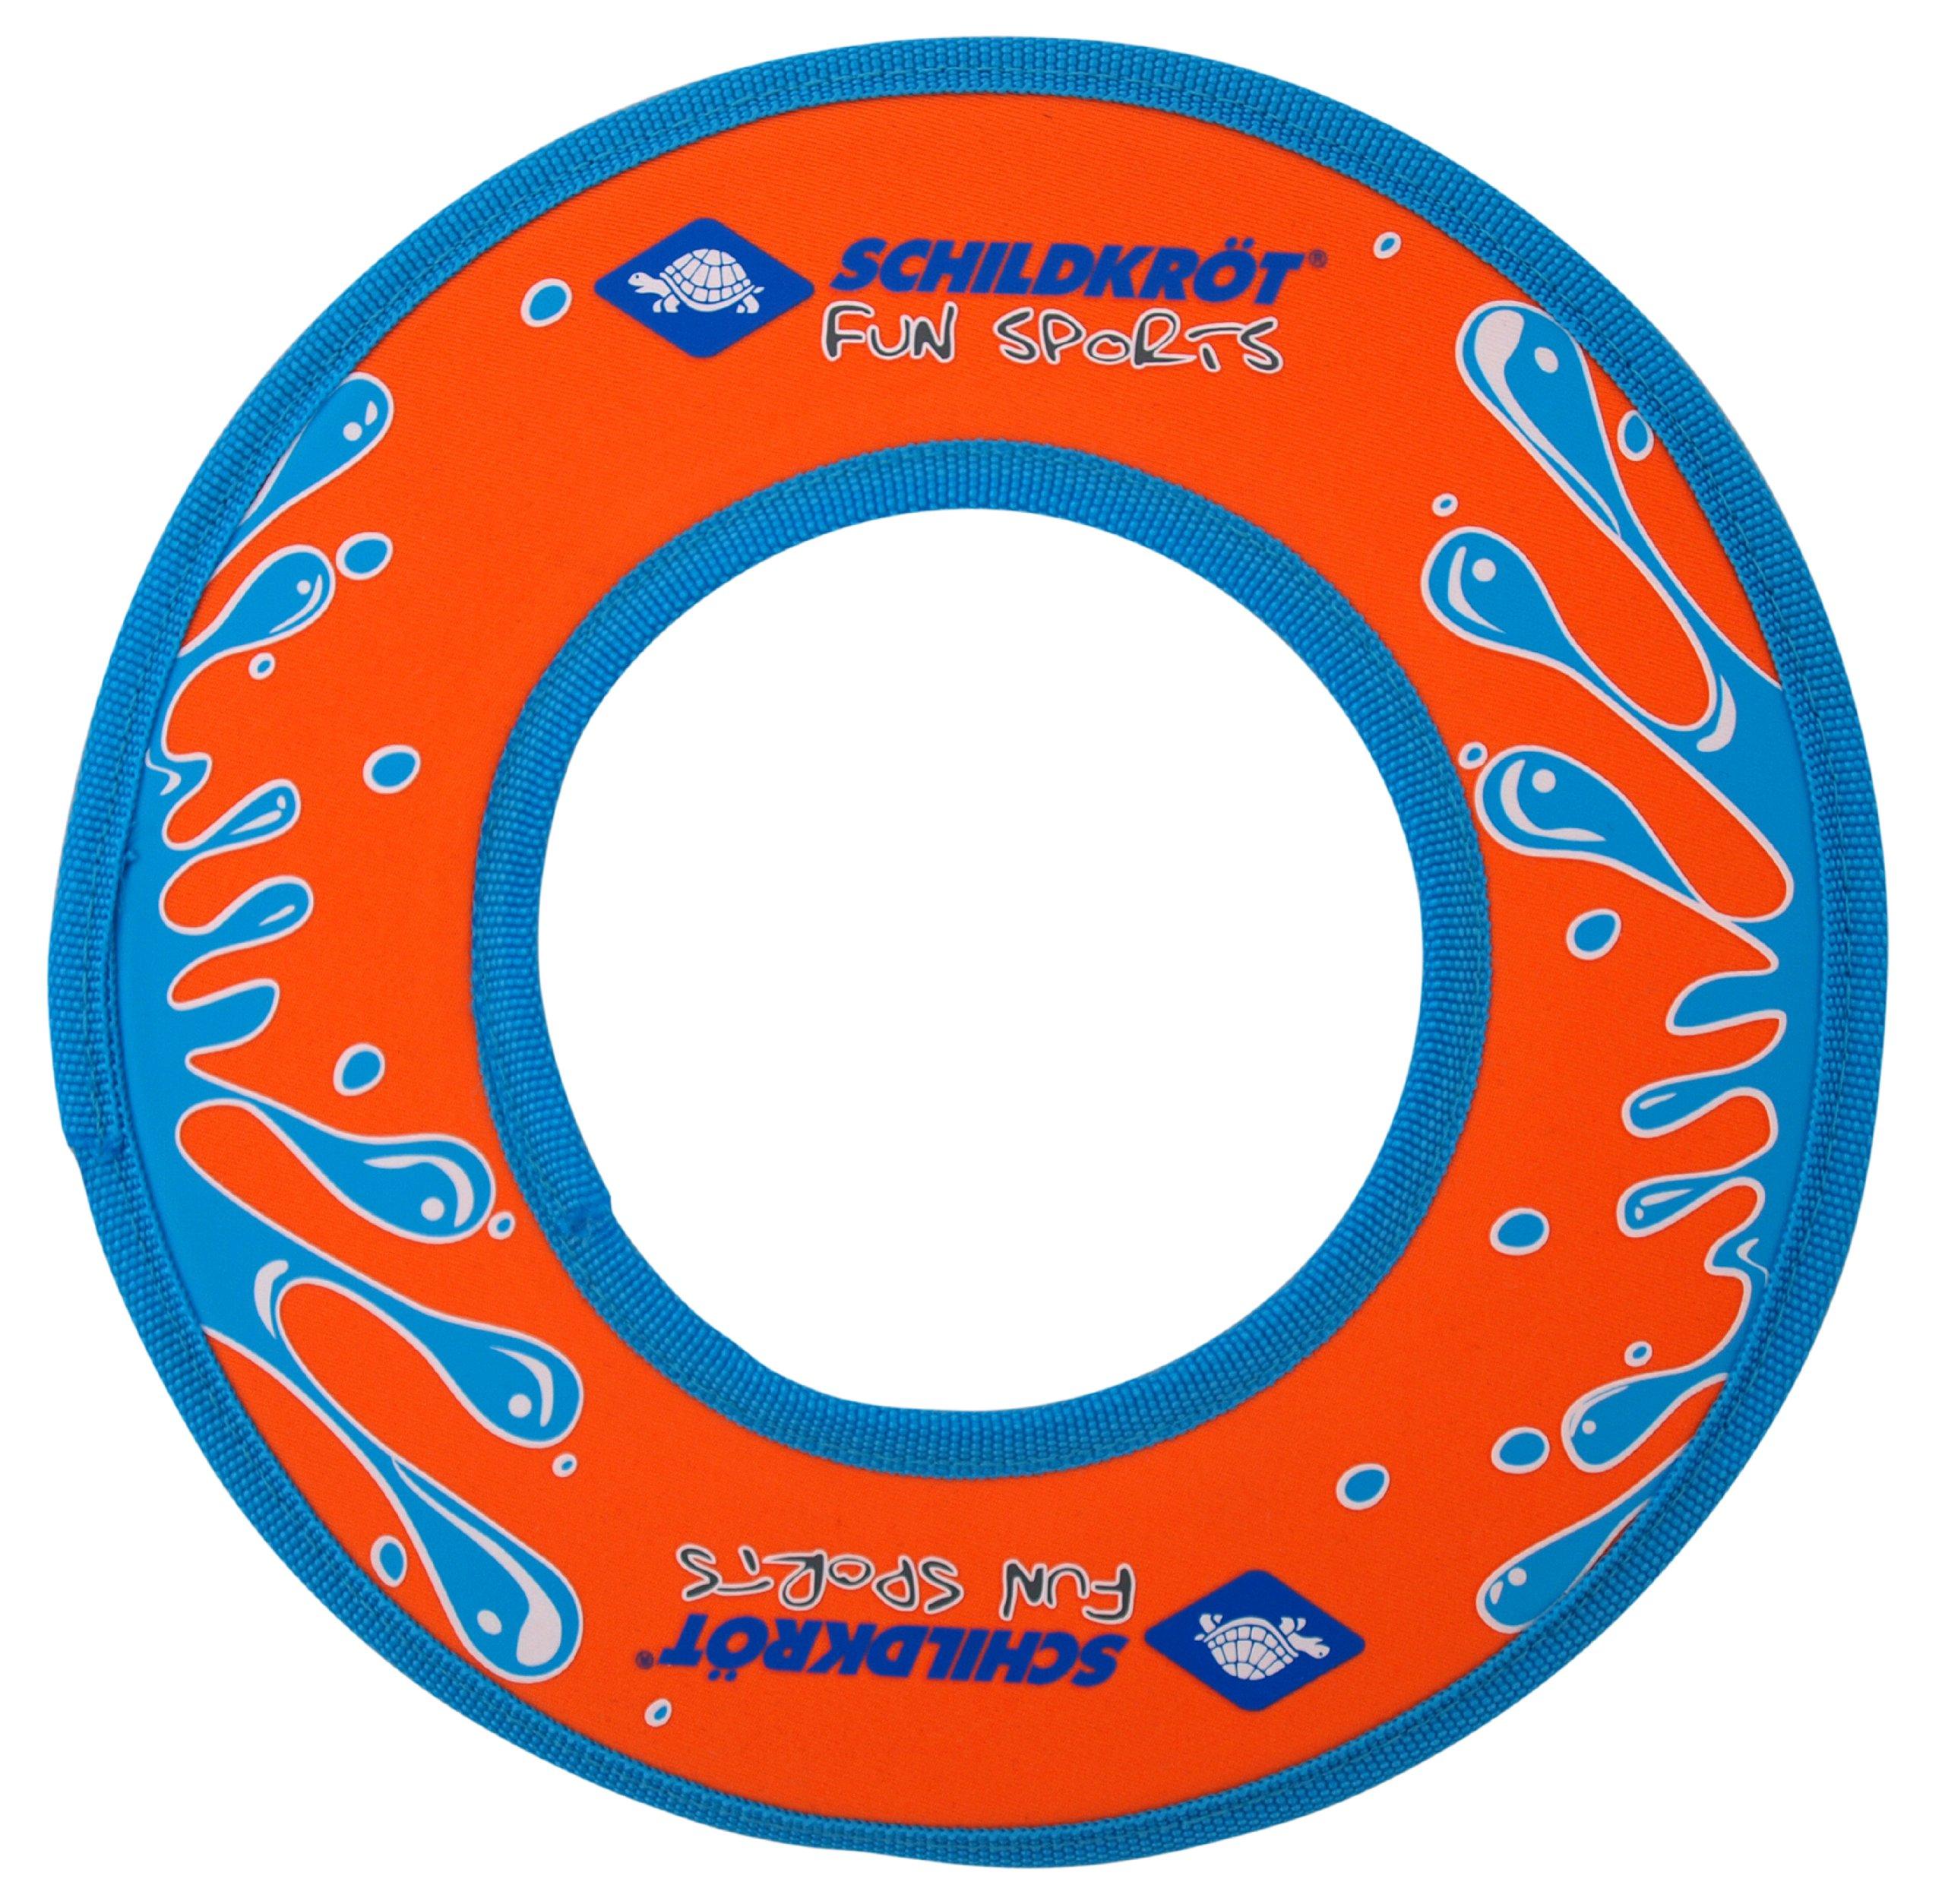 Schildkröt Neopren Ring, Wurfring, Ø 24cm, präziser Flug, wählbar, im Blister product image